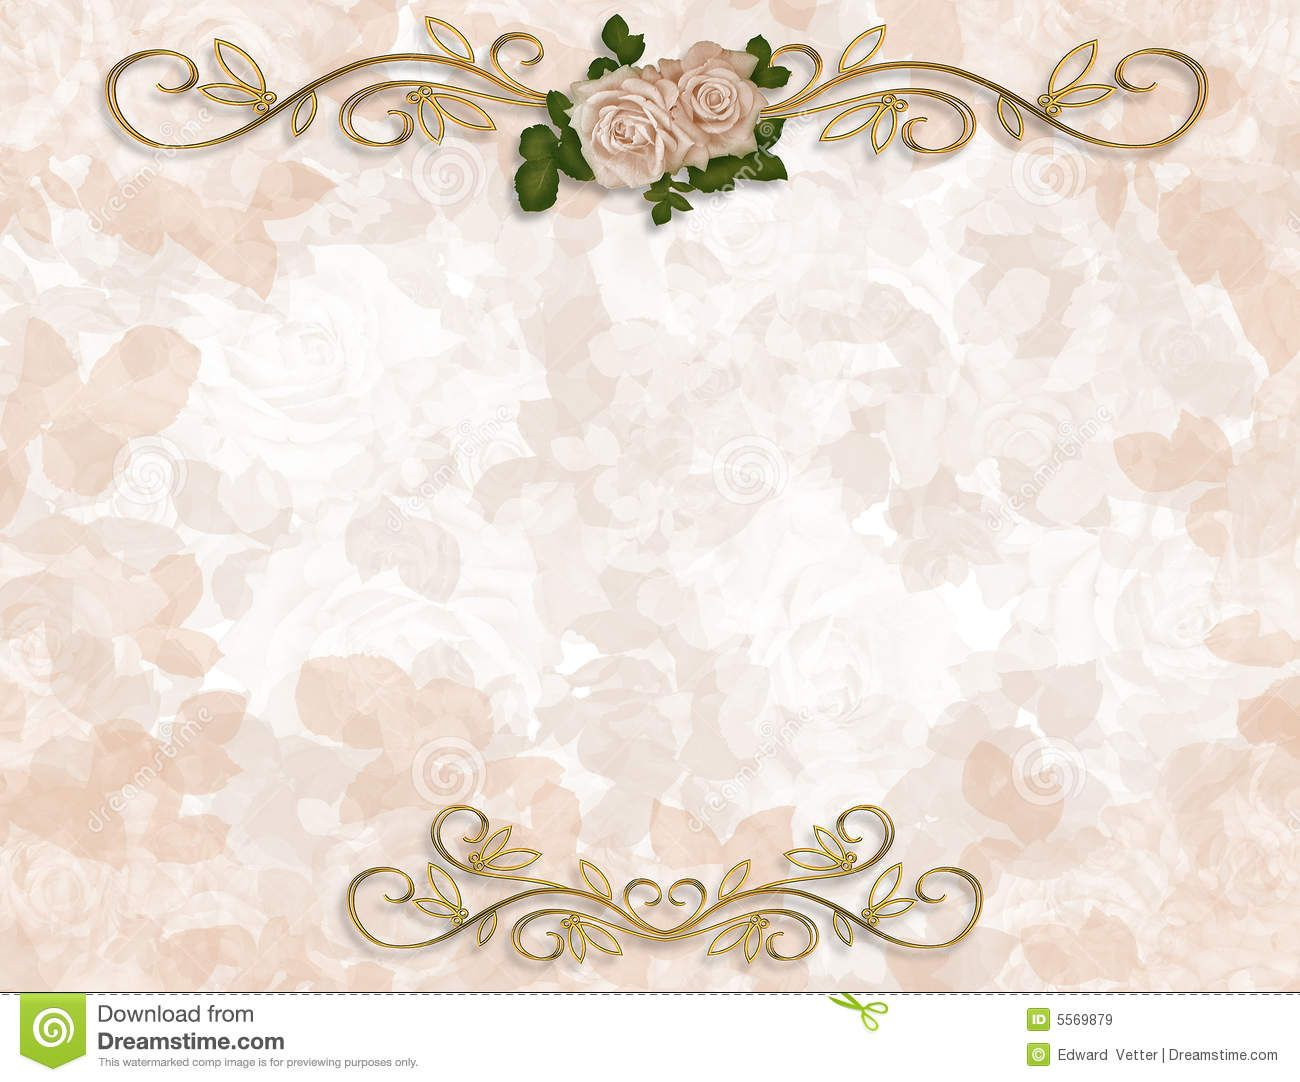 Wedding Backgrounds Free Download Google Trsene Wedding Invitation Background Wedding Invitation Size Rose Wedding Invitations